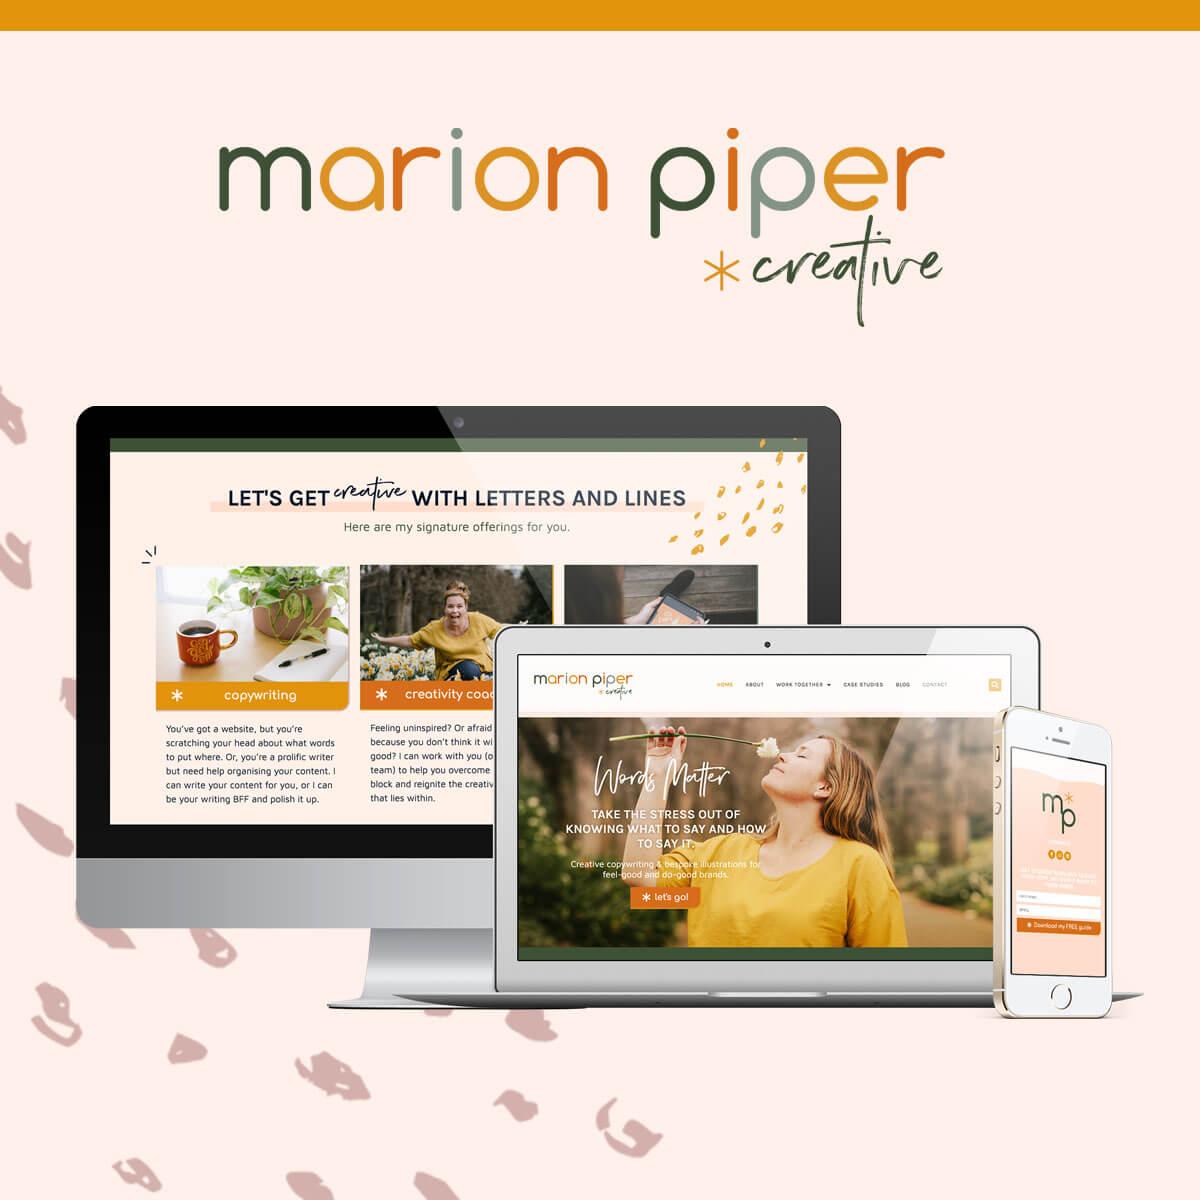 Marion-Piper-Creative-Promo-4